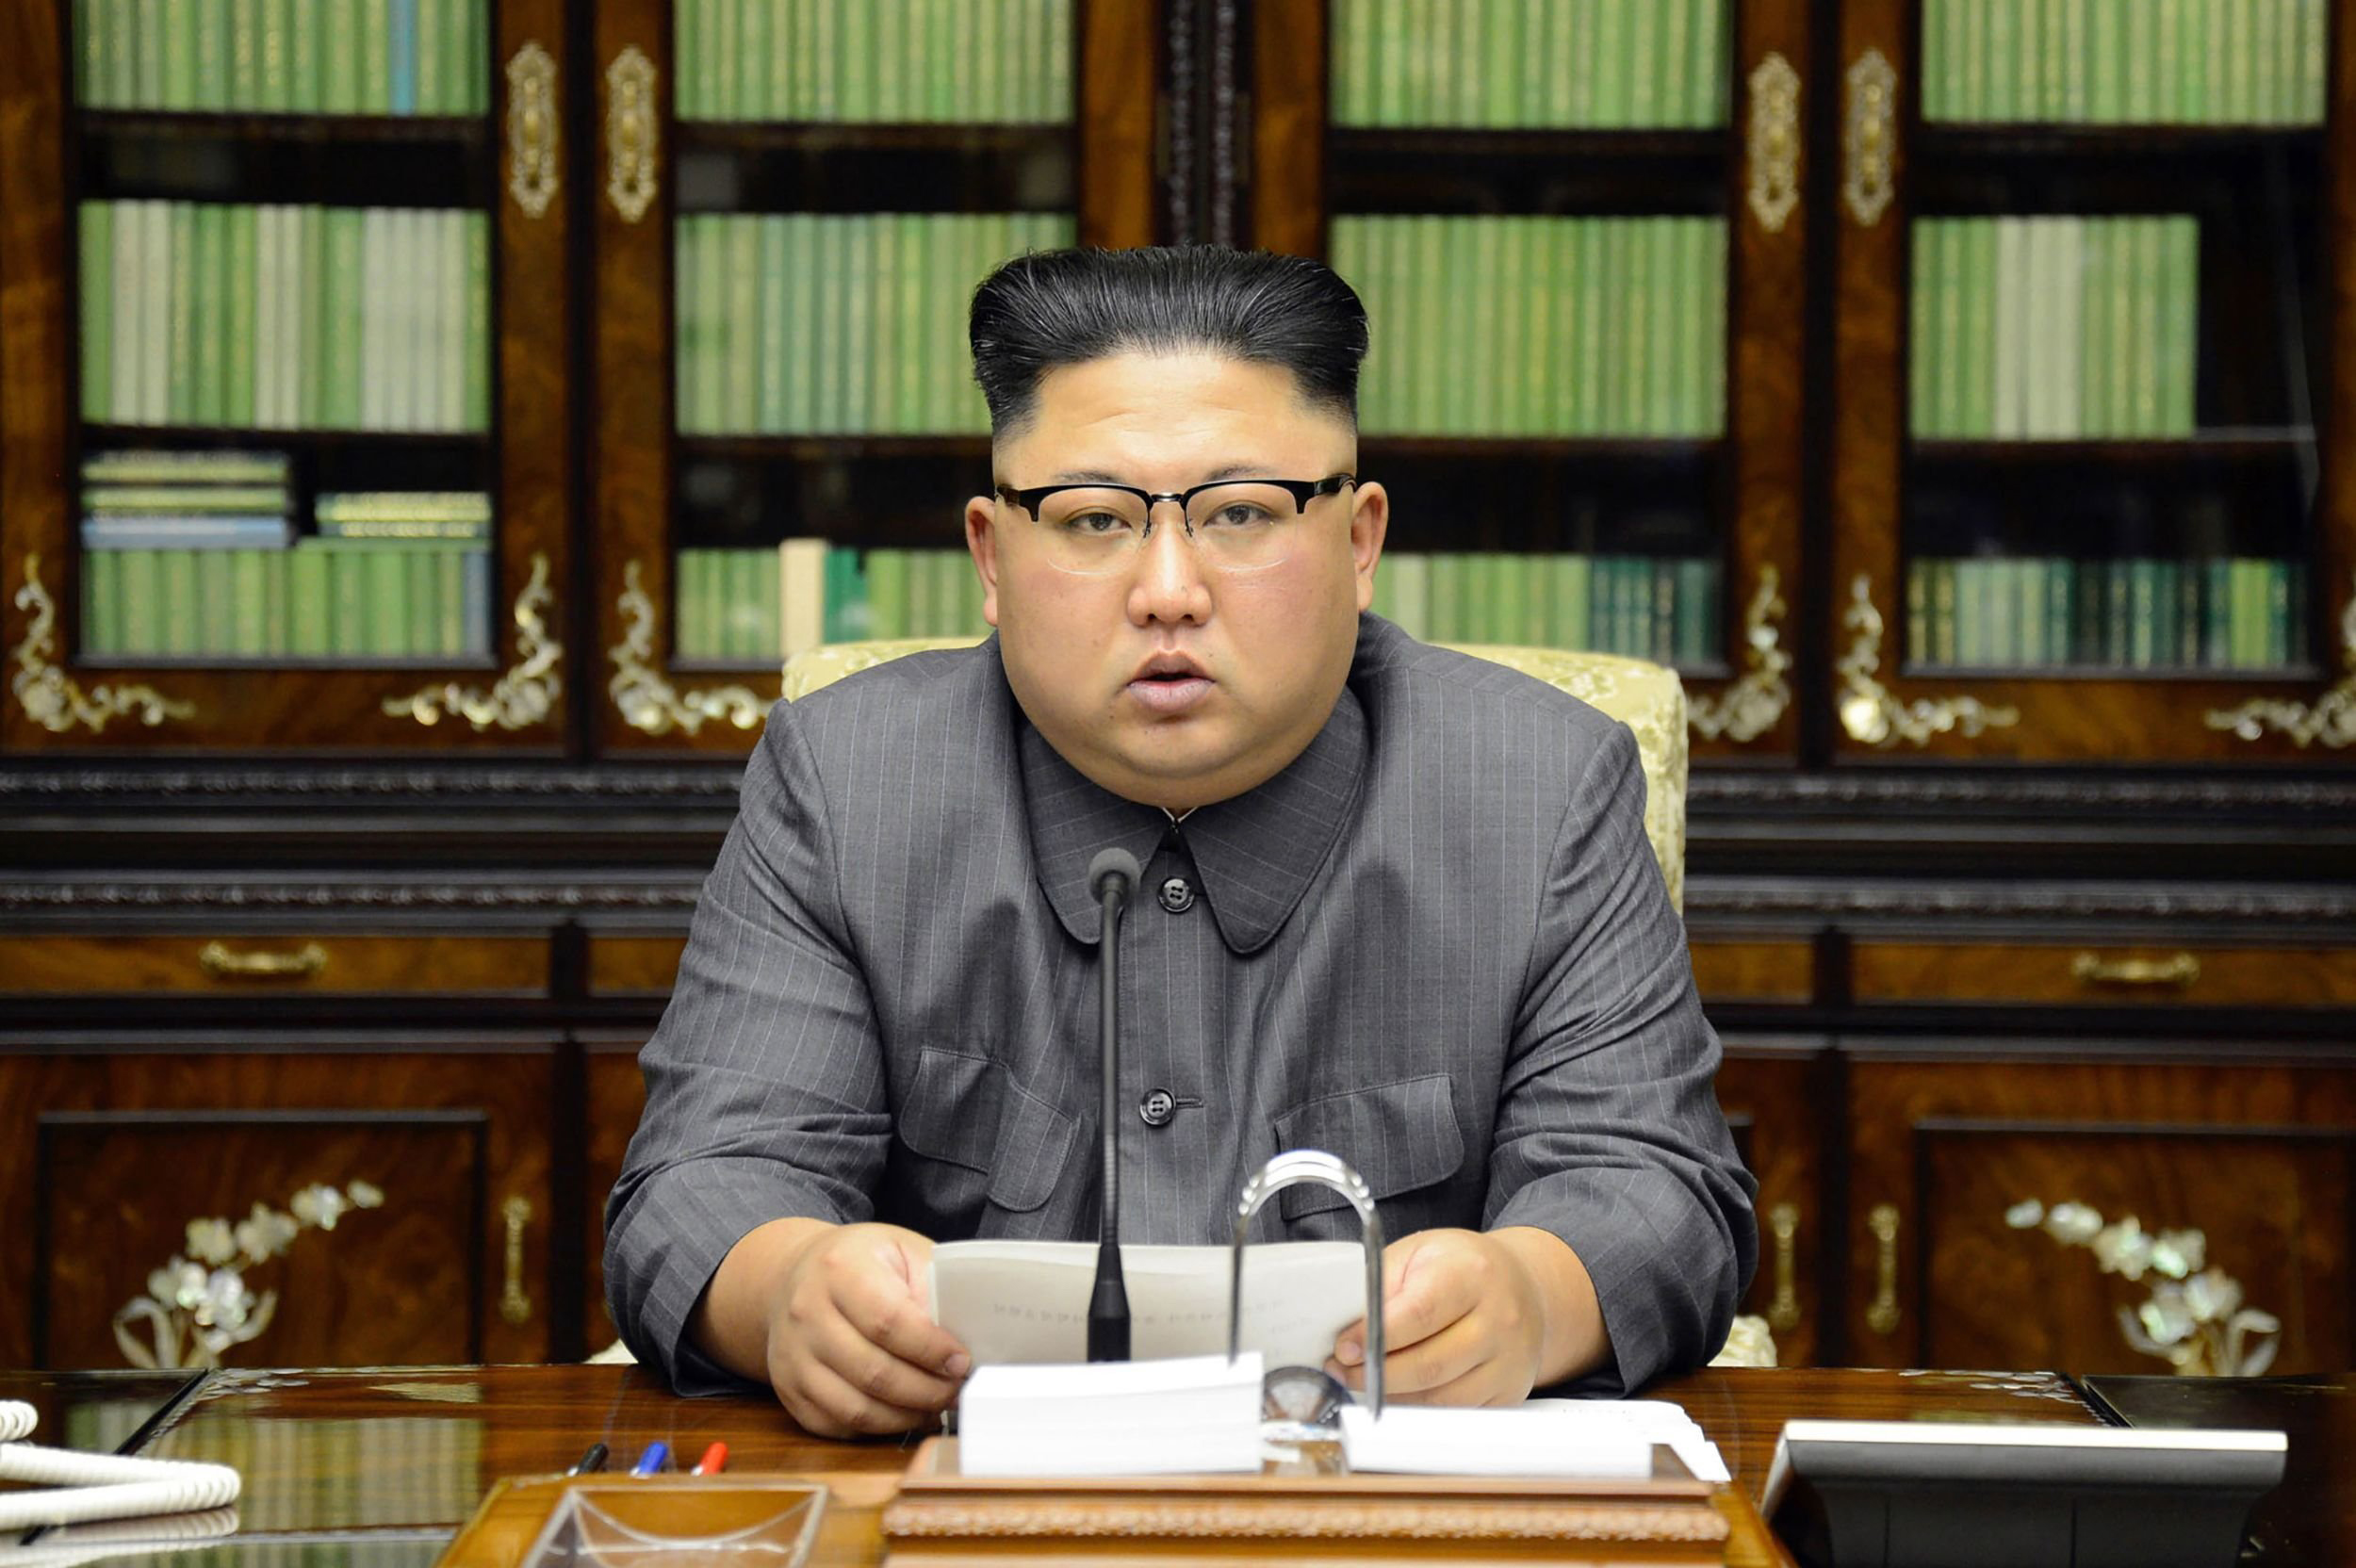 Kim Jong Un Calls President Trump Dotard And Frightened Dog